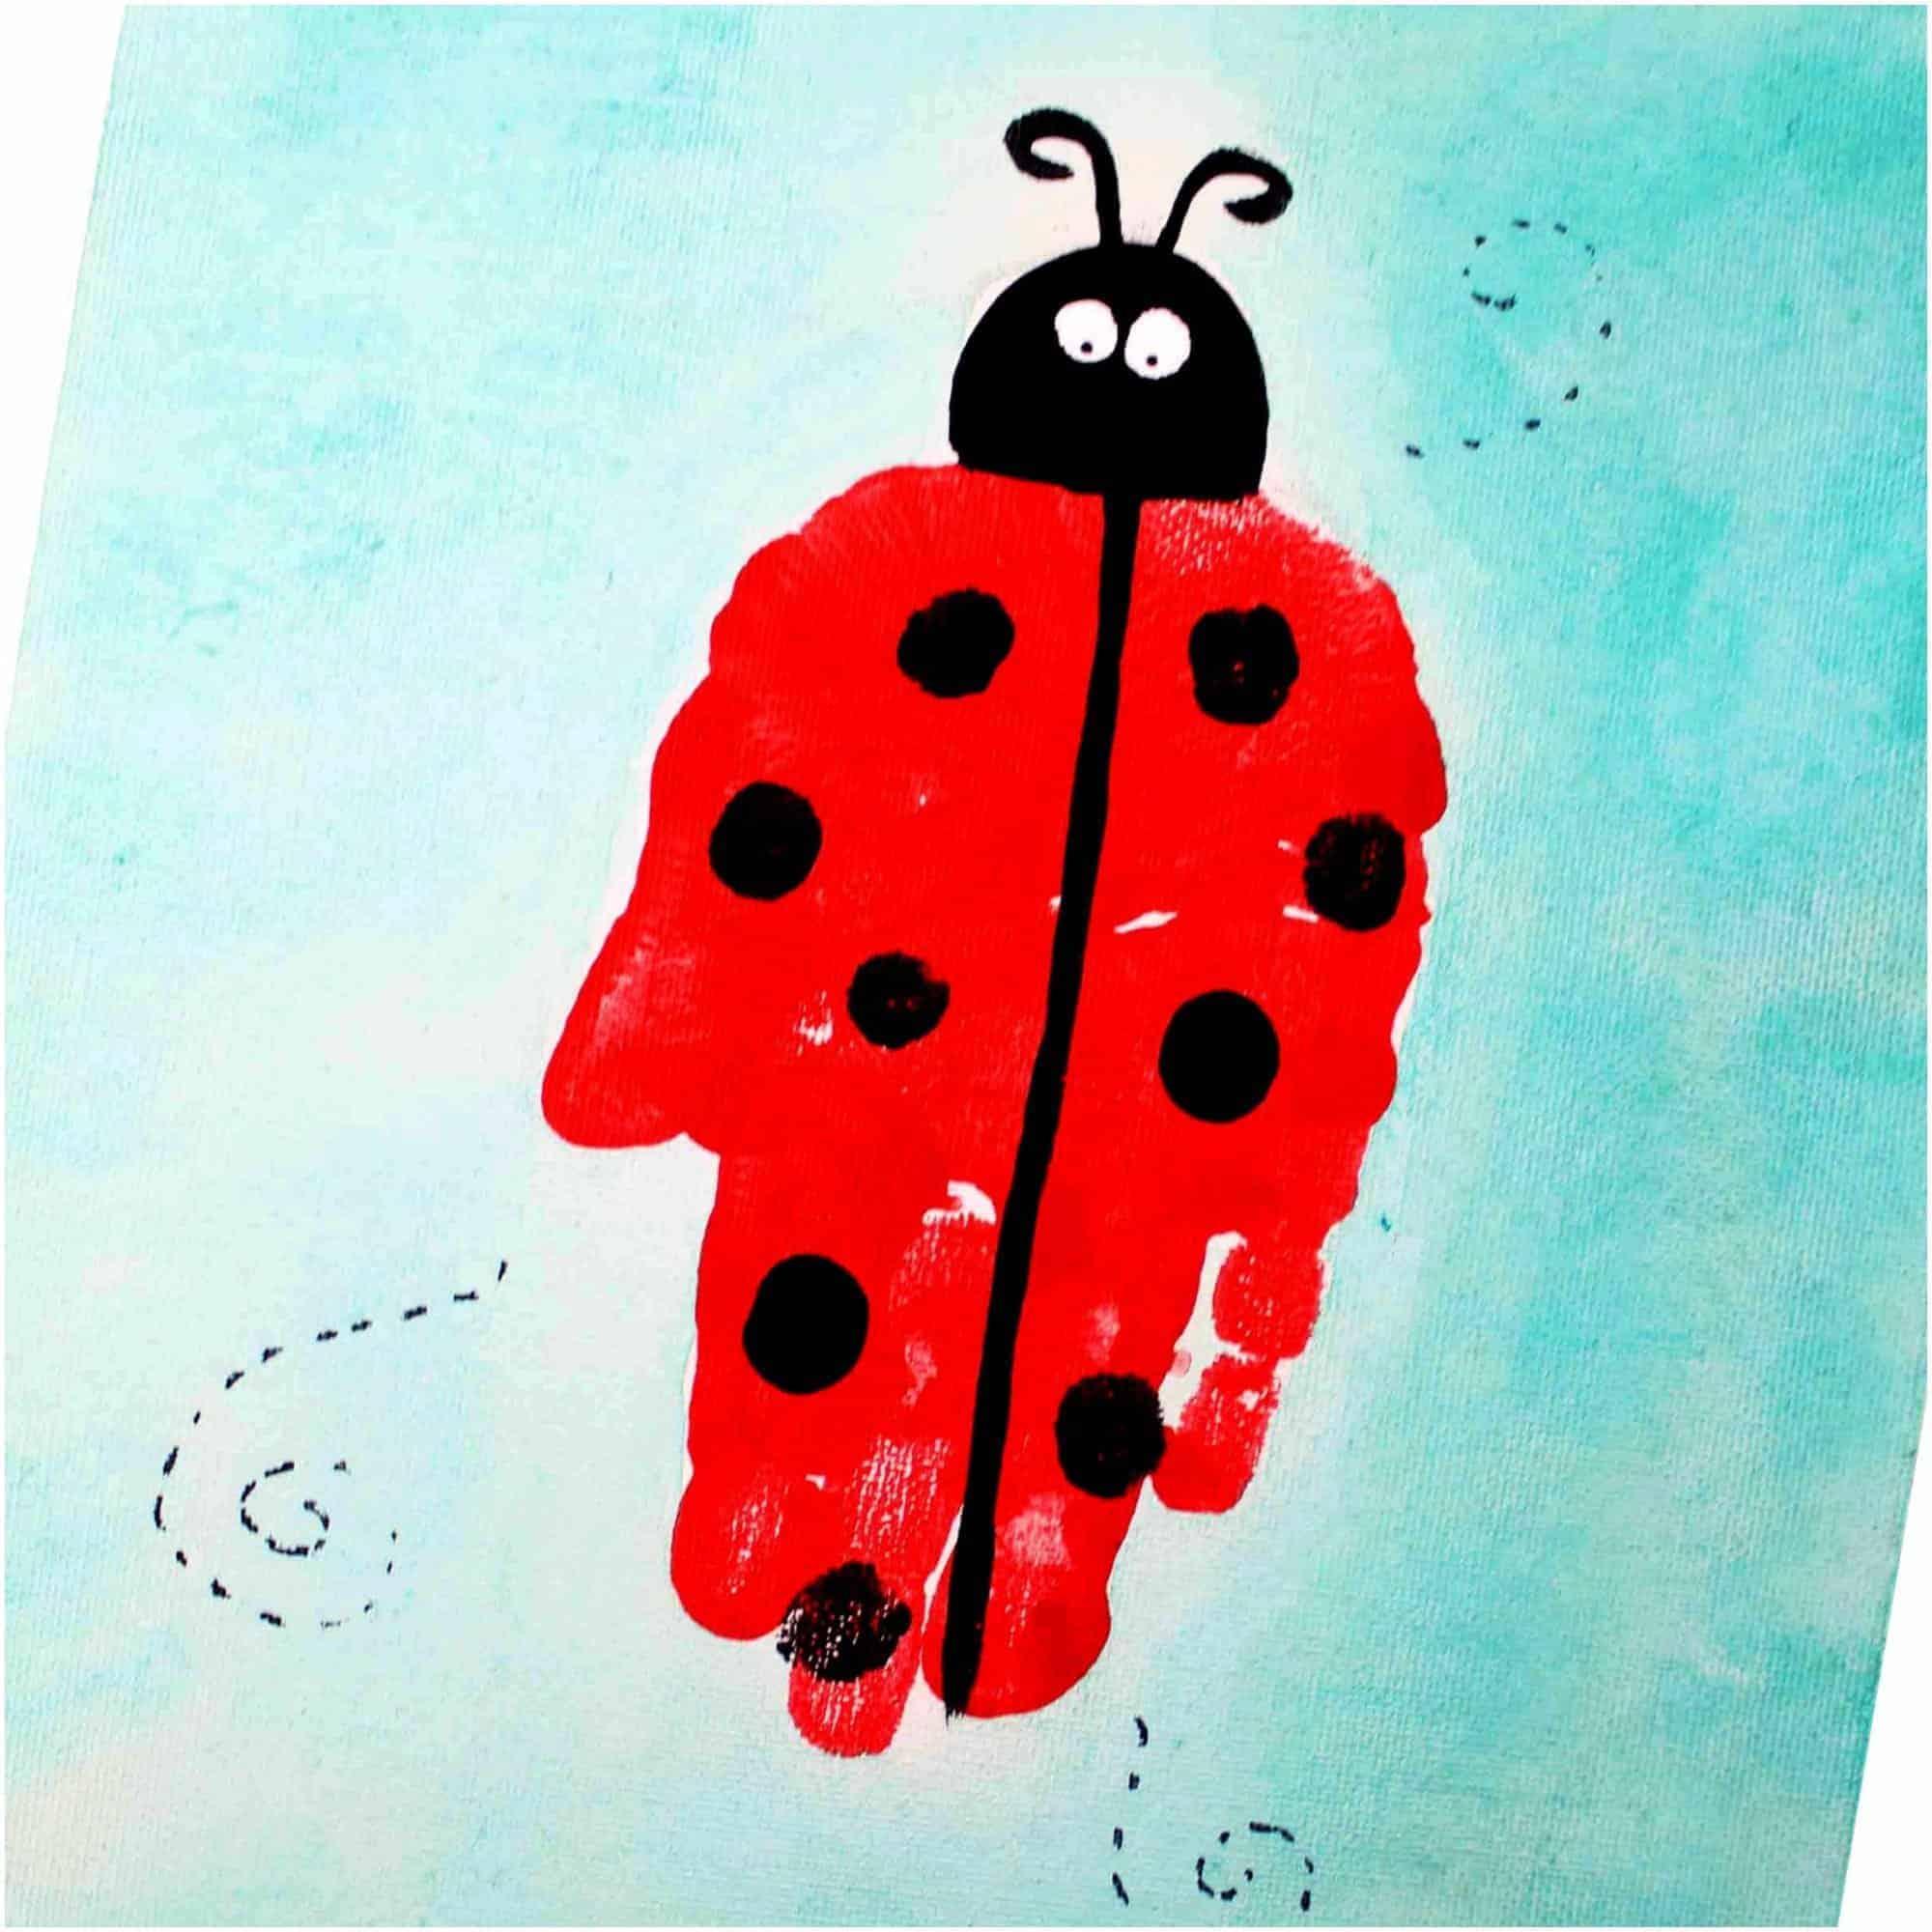 Ladybug Handprint Art For Preschool Kids The Inspiration